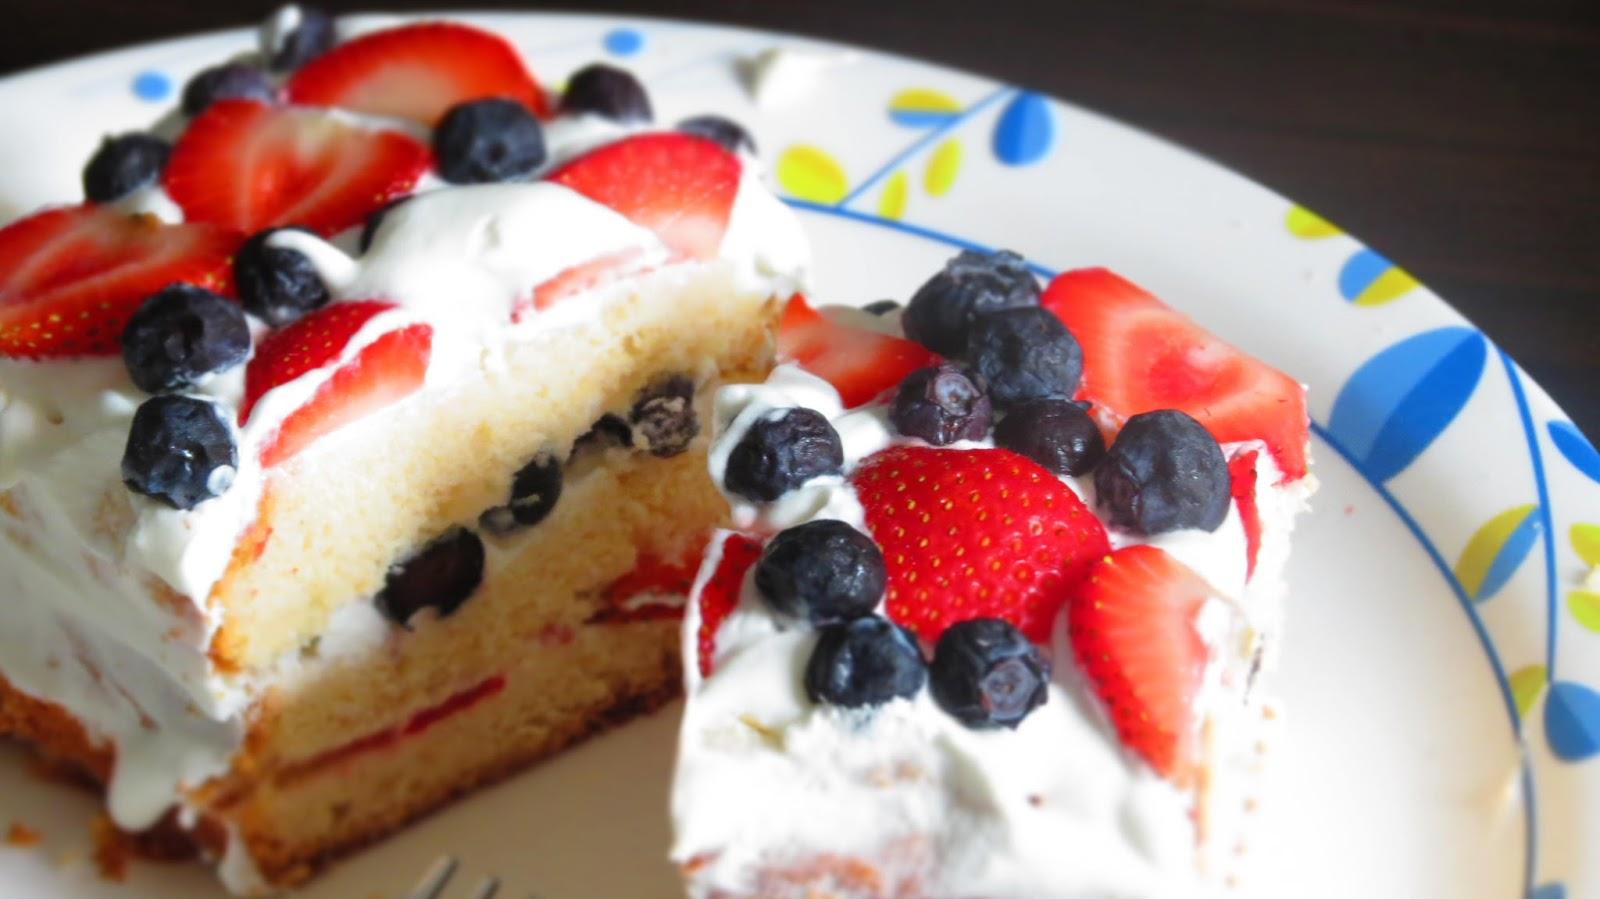 Cake With Whipped Cream And Fresh Fruit : mittu cooking love: Fresh Fruit Cake with Homemade Whipped ...